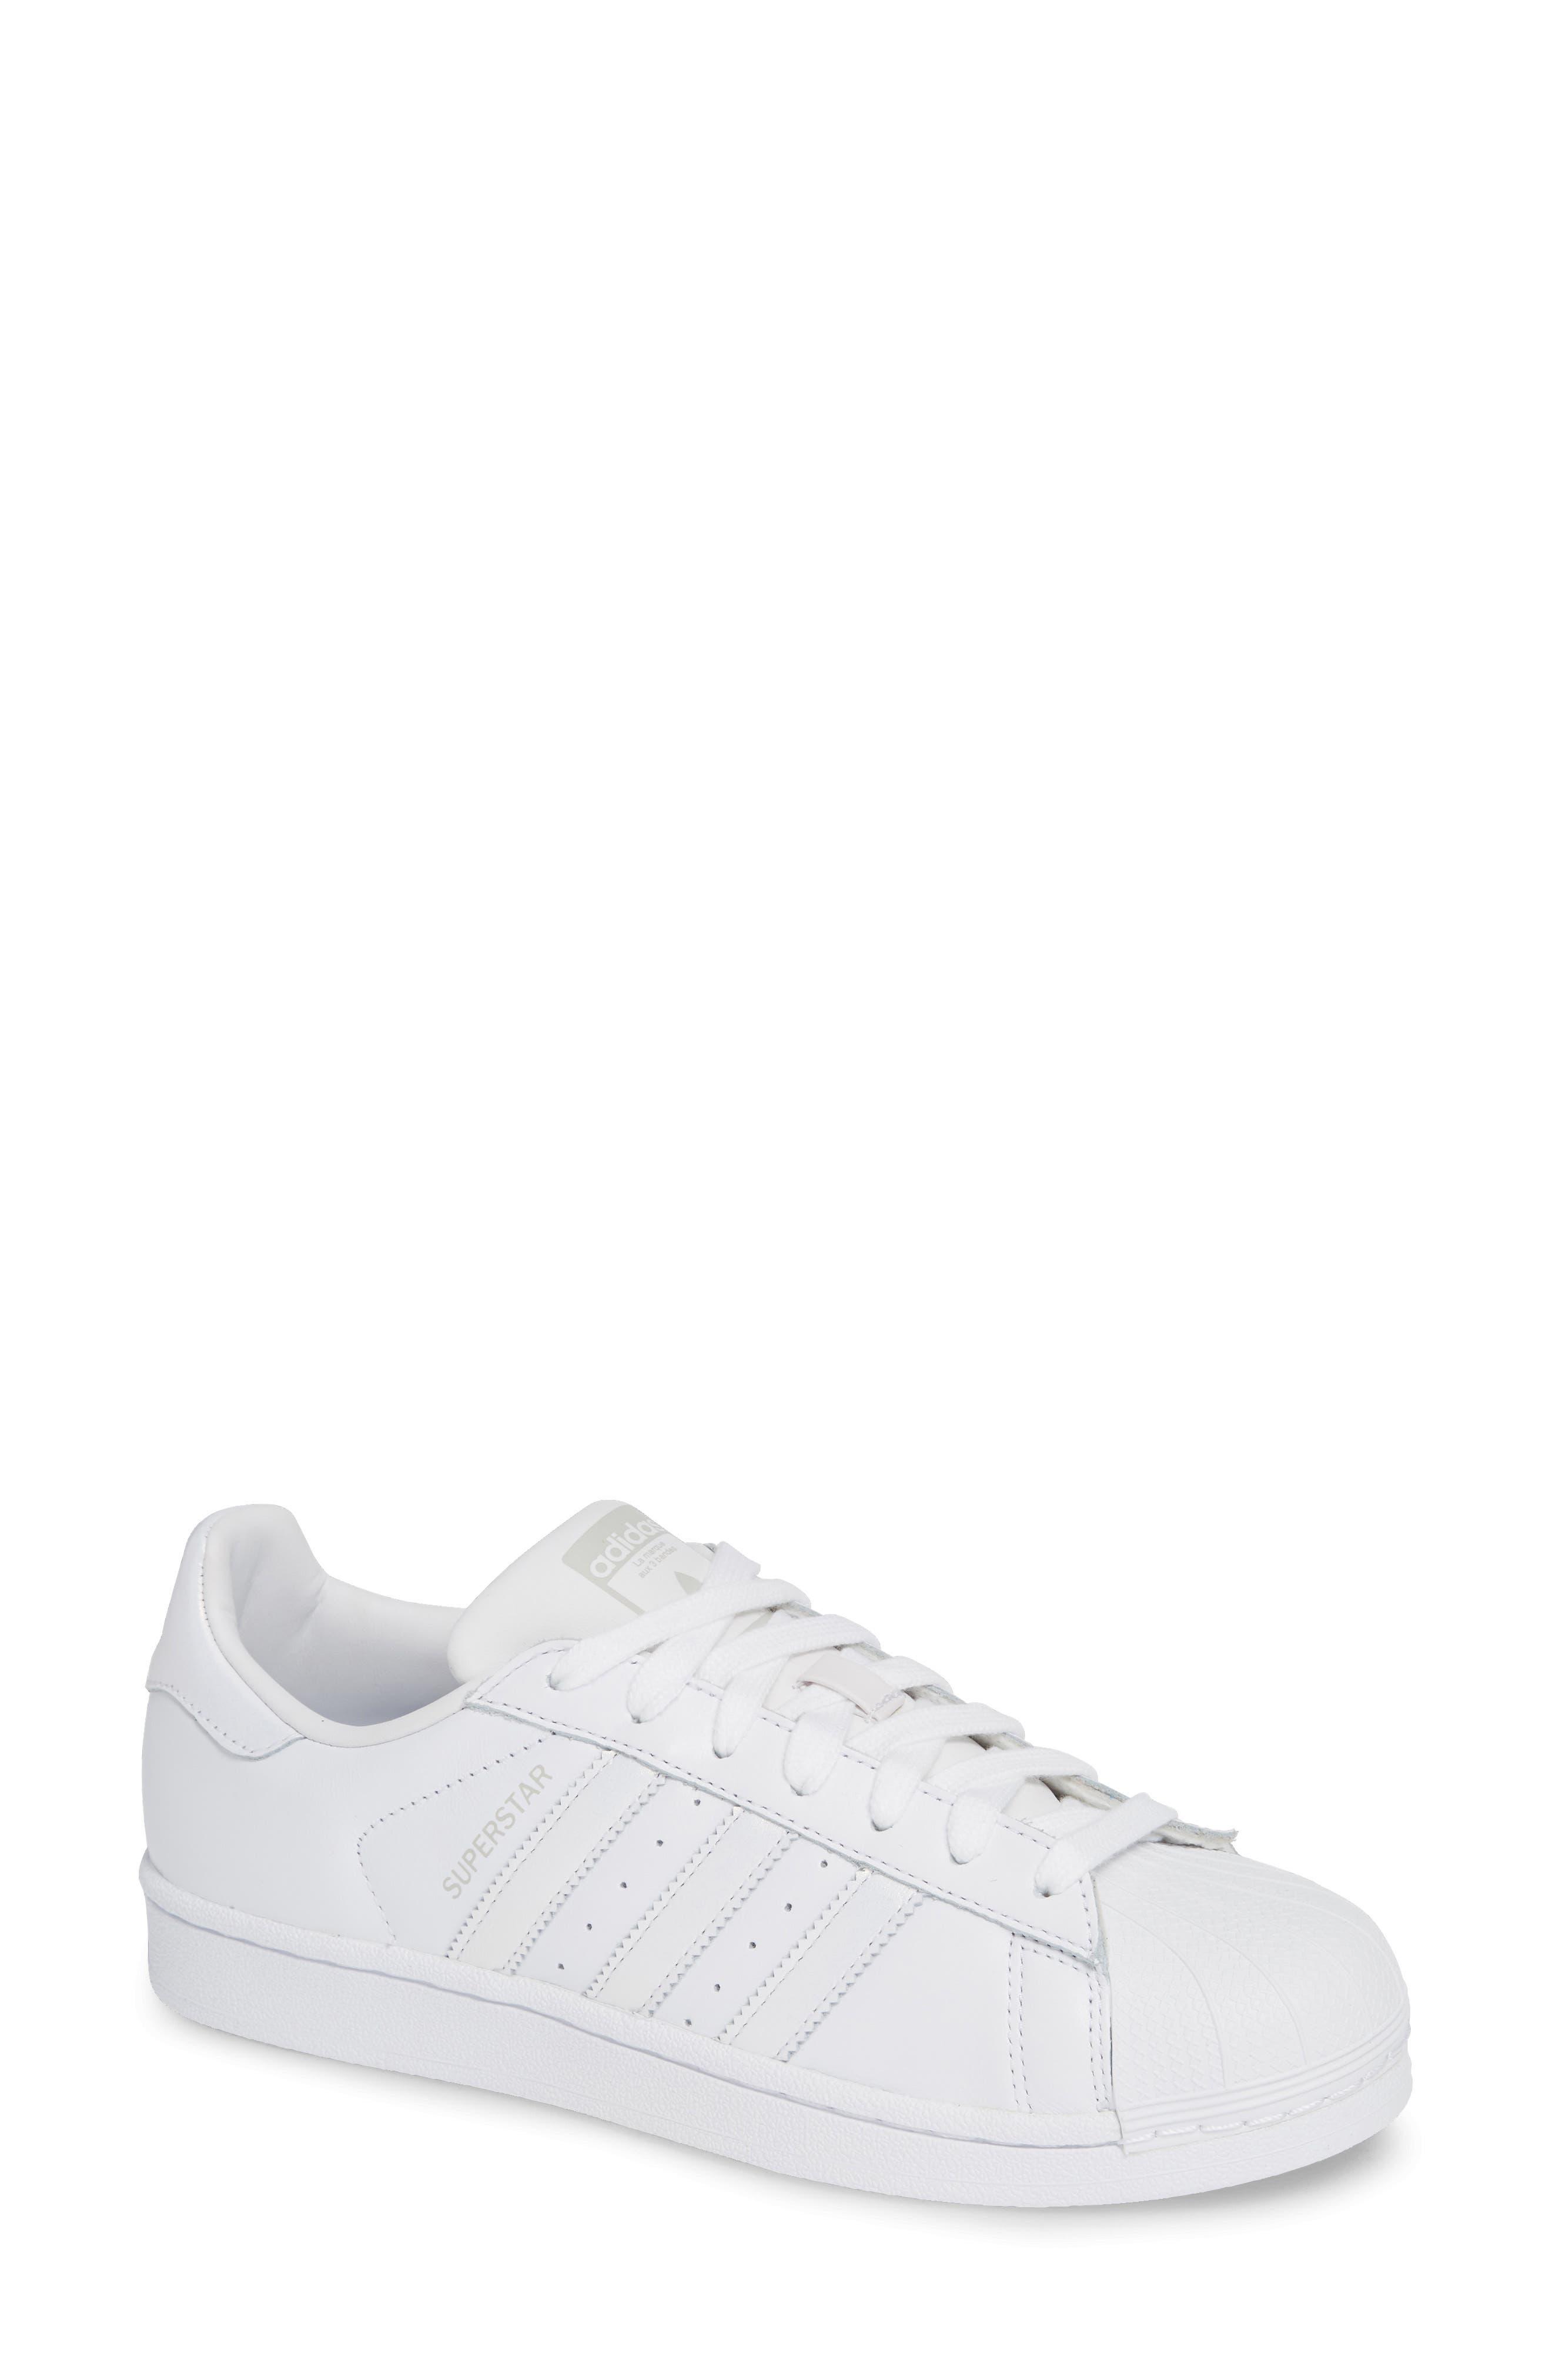 Superstar Sneaker,                             Main thumbnail 1, color,                             White/ White/ Grey One